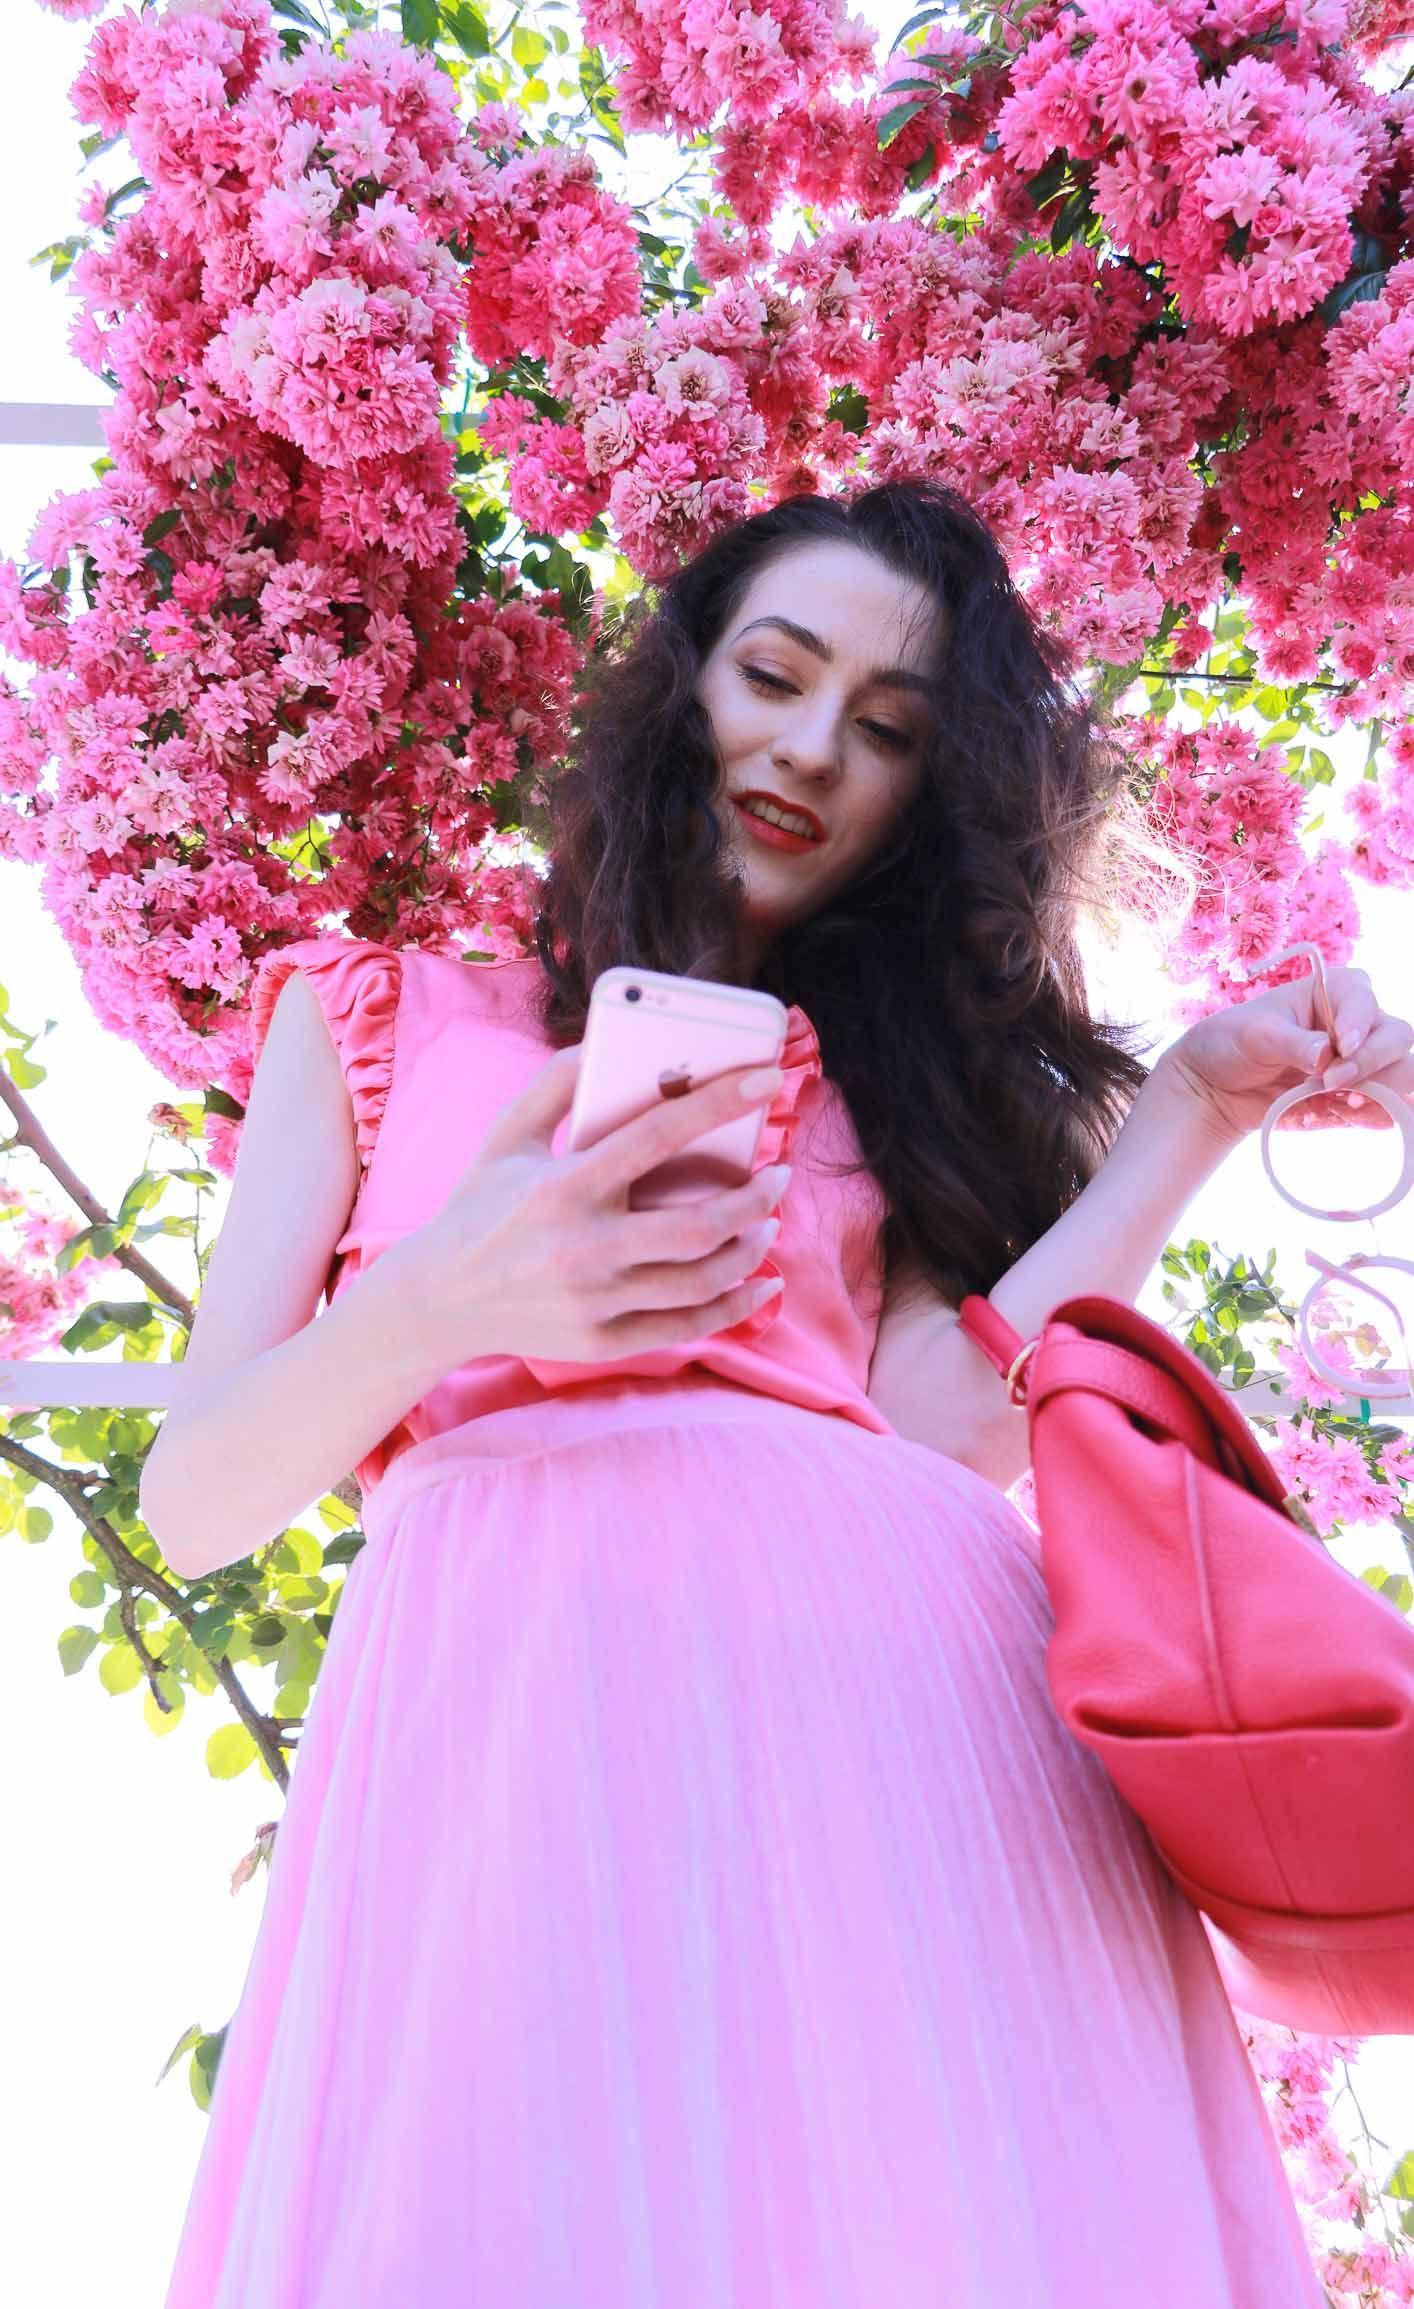 4f0f82968534 Fashion Blogger Veronika Lipar of Brunette from Wall Street wearing bold  red lips